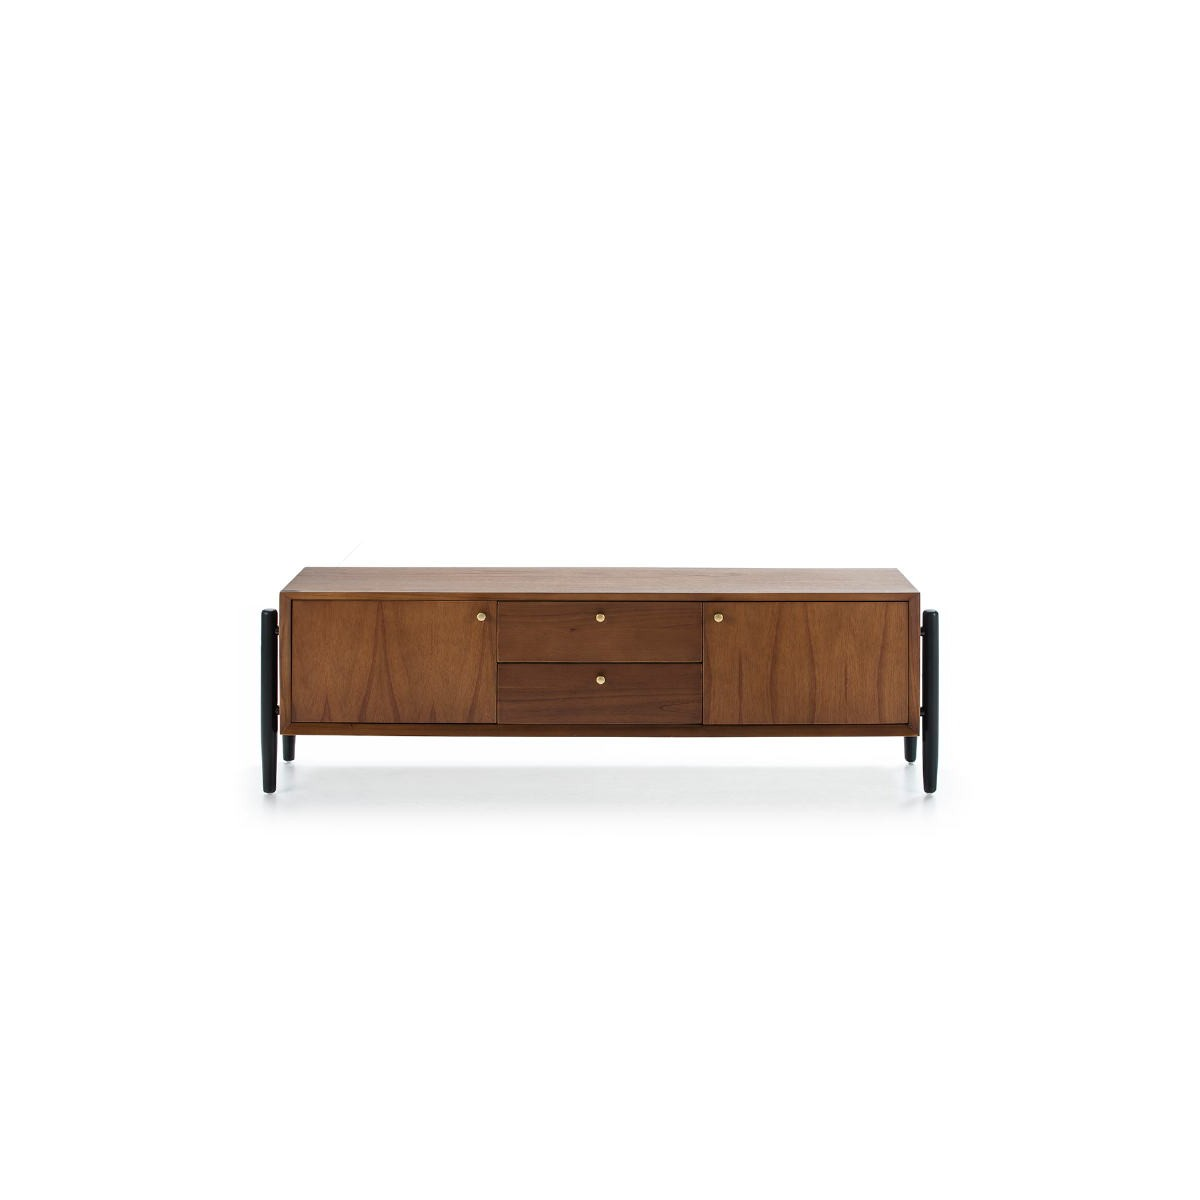 meuble tv 2 portes 2 tiroirs 160x40x50 bois brun noir amp story 7647